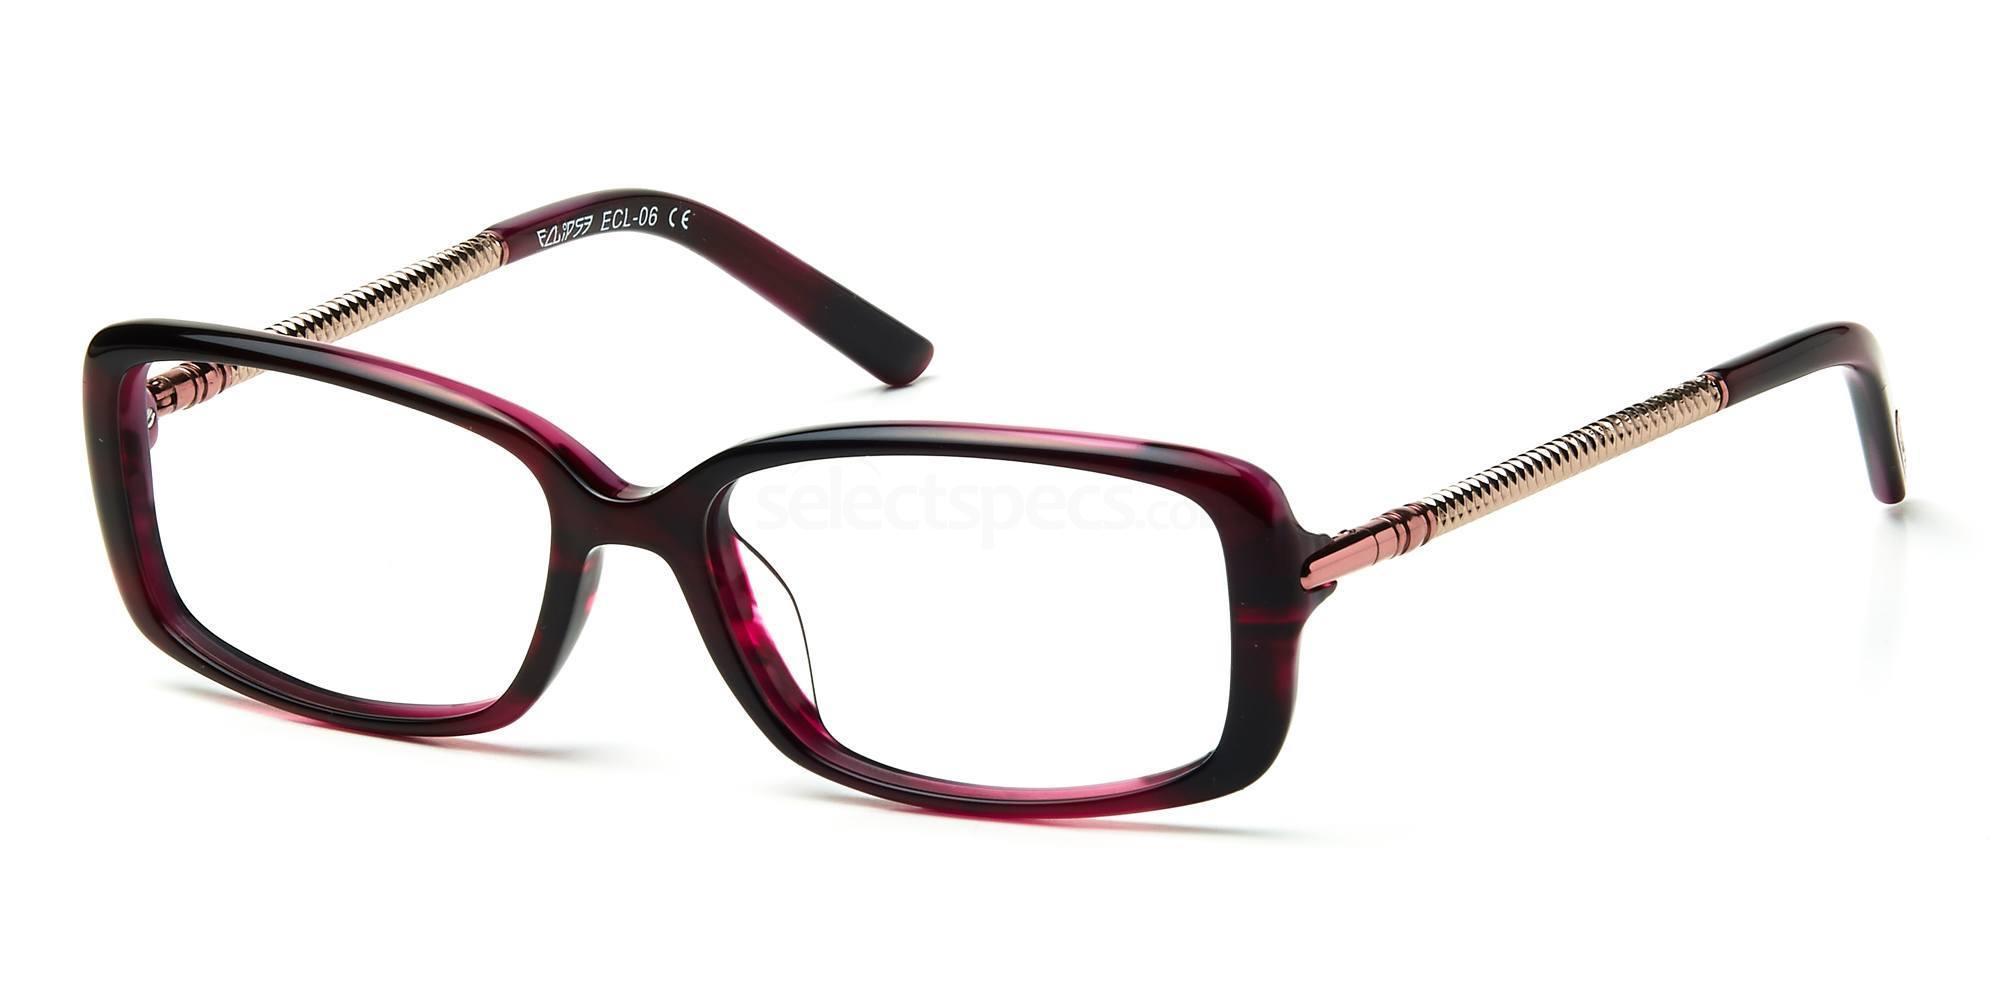 C1 ECL06 Glasses, Eclipse